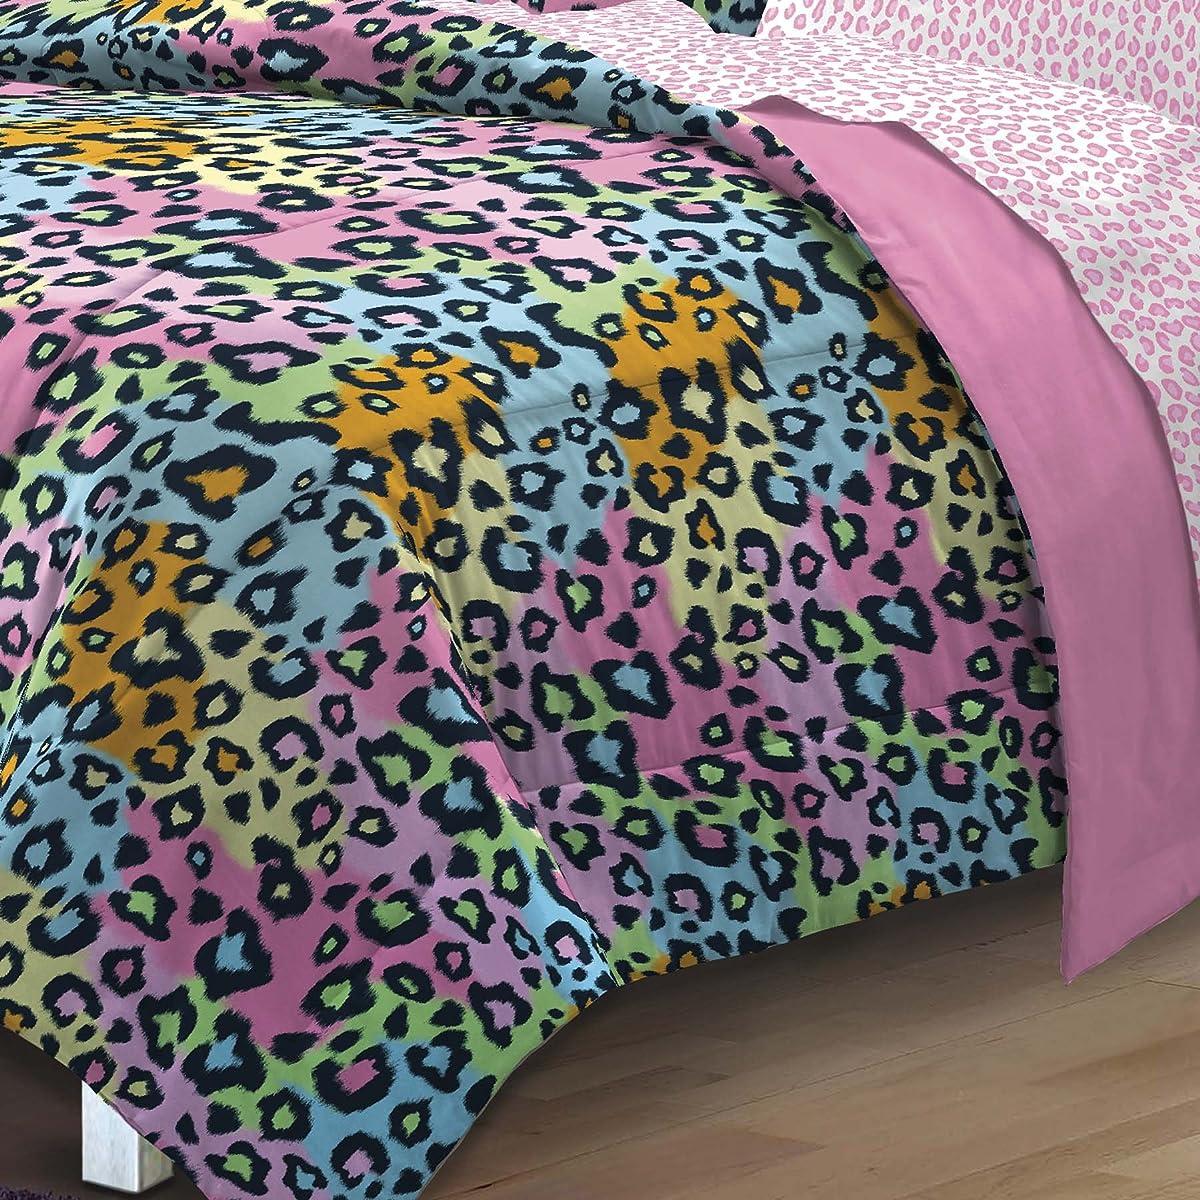 My Room Neon Leopard Ultra Soft Microfiber Girls Comforter Set, Multi-Colored, Twin/Twin X-Large